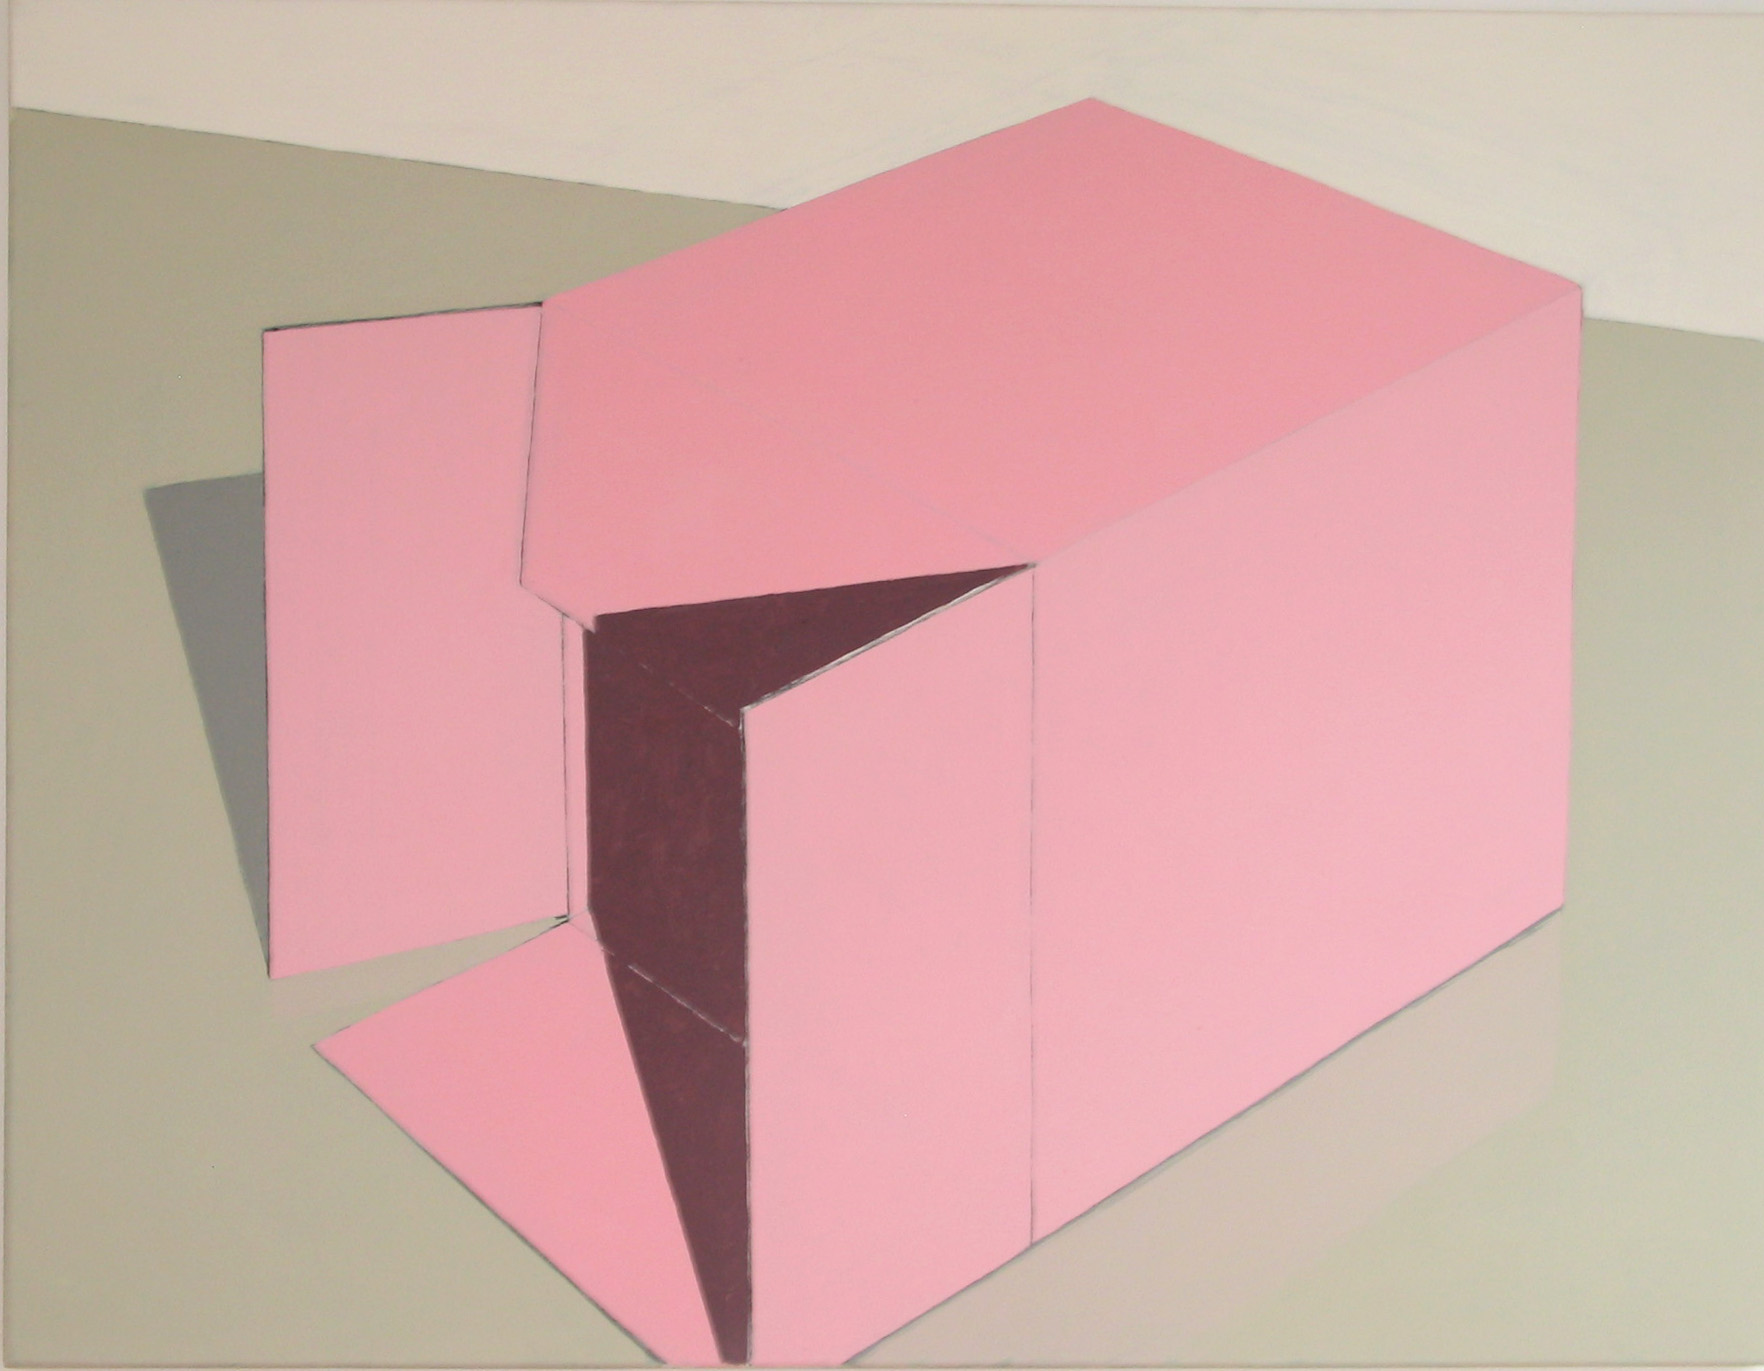 pink cardboard box 2013